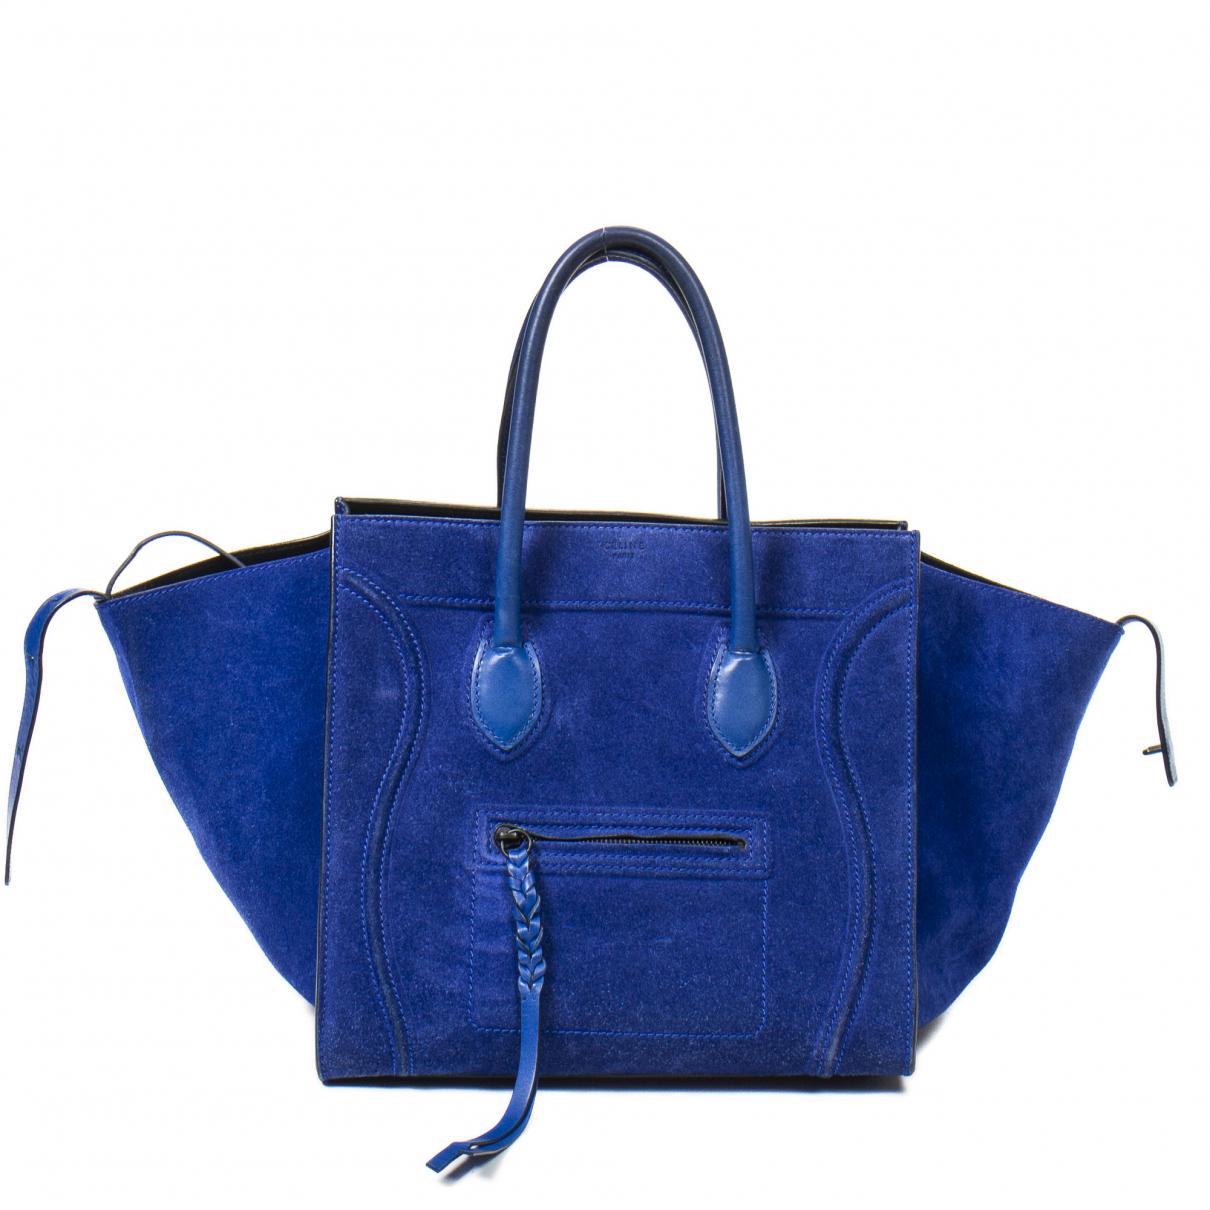 Celine Luggage Phantom Blue Leather handbag for Women \N